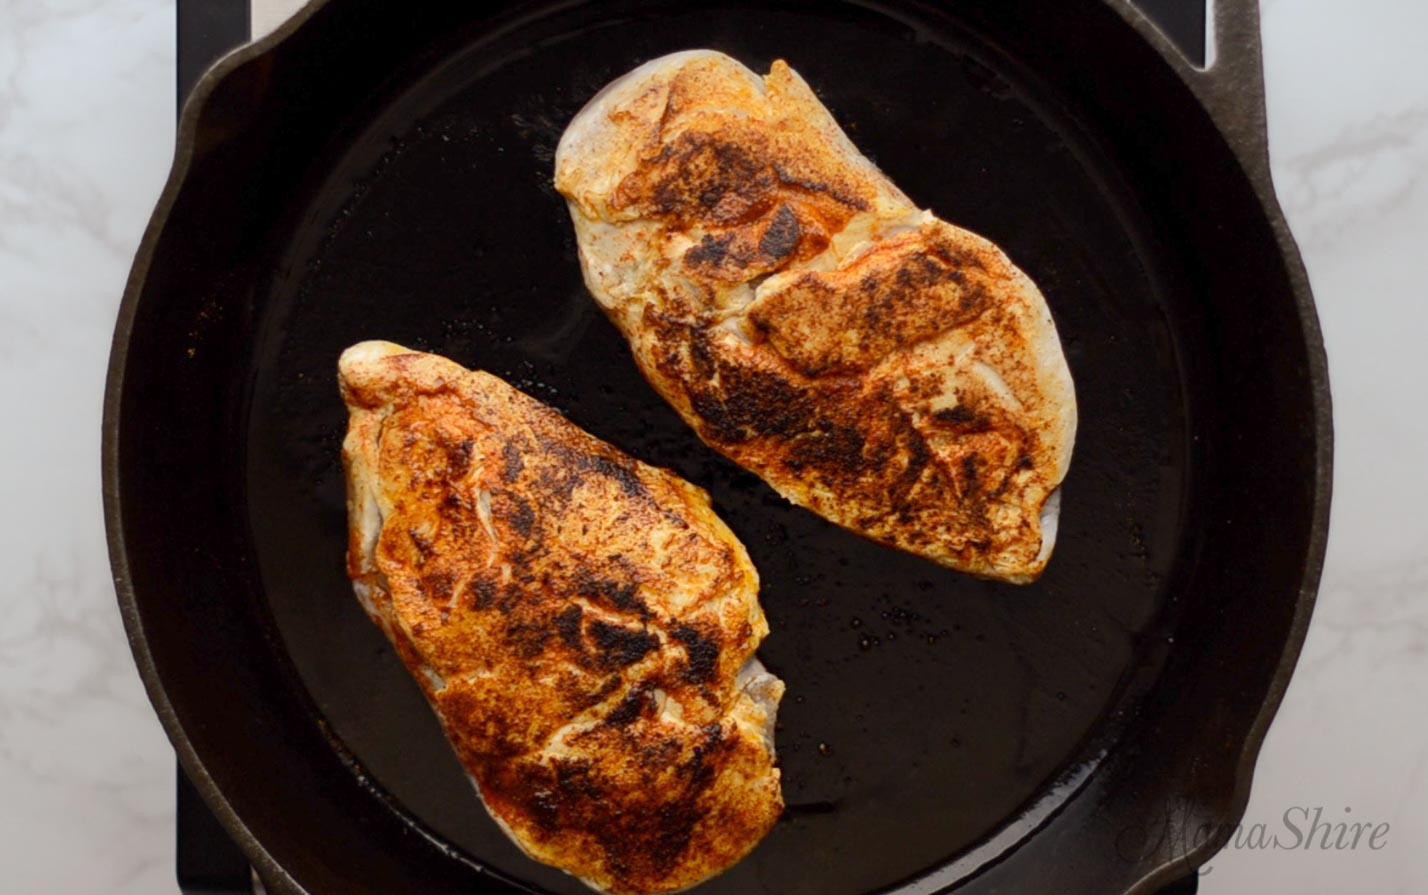 Searing seasoned chicken in a black iron skillet.